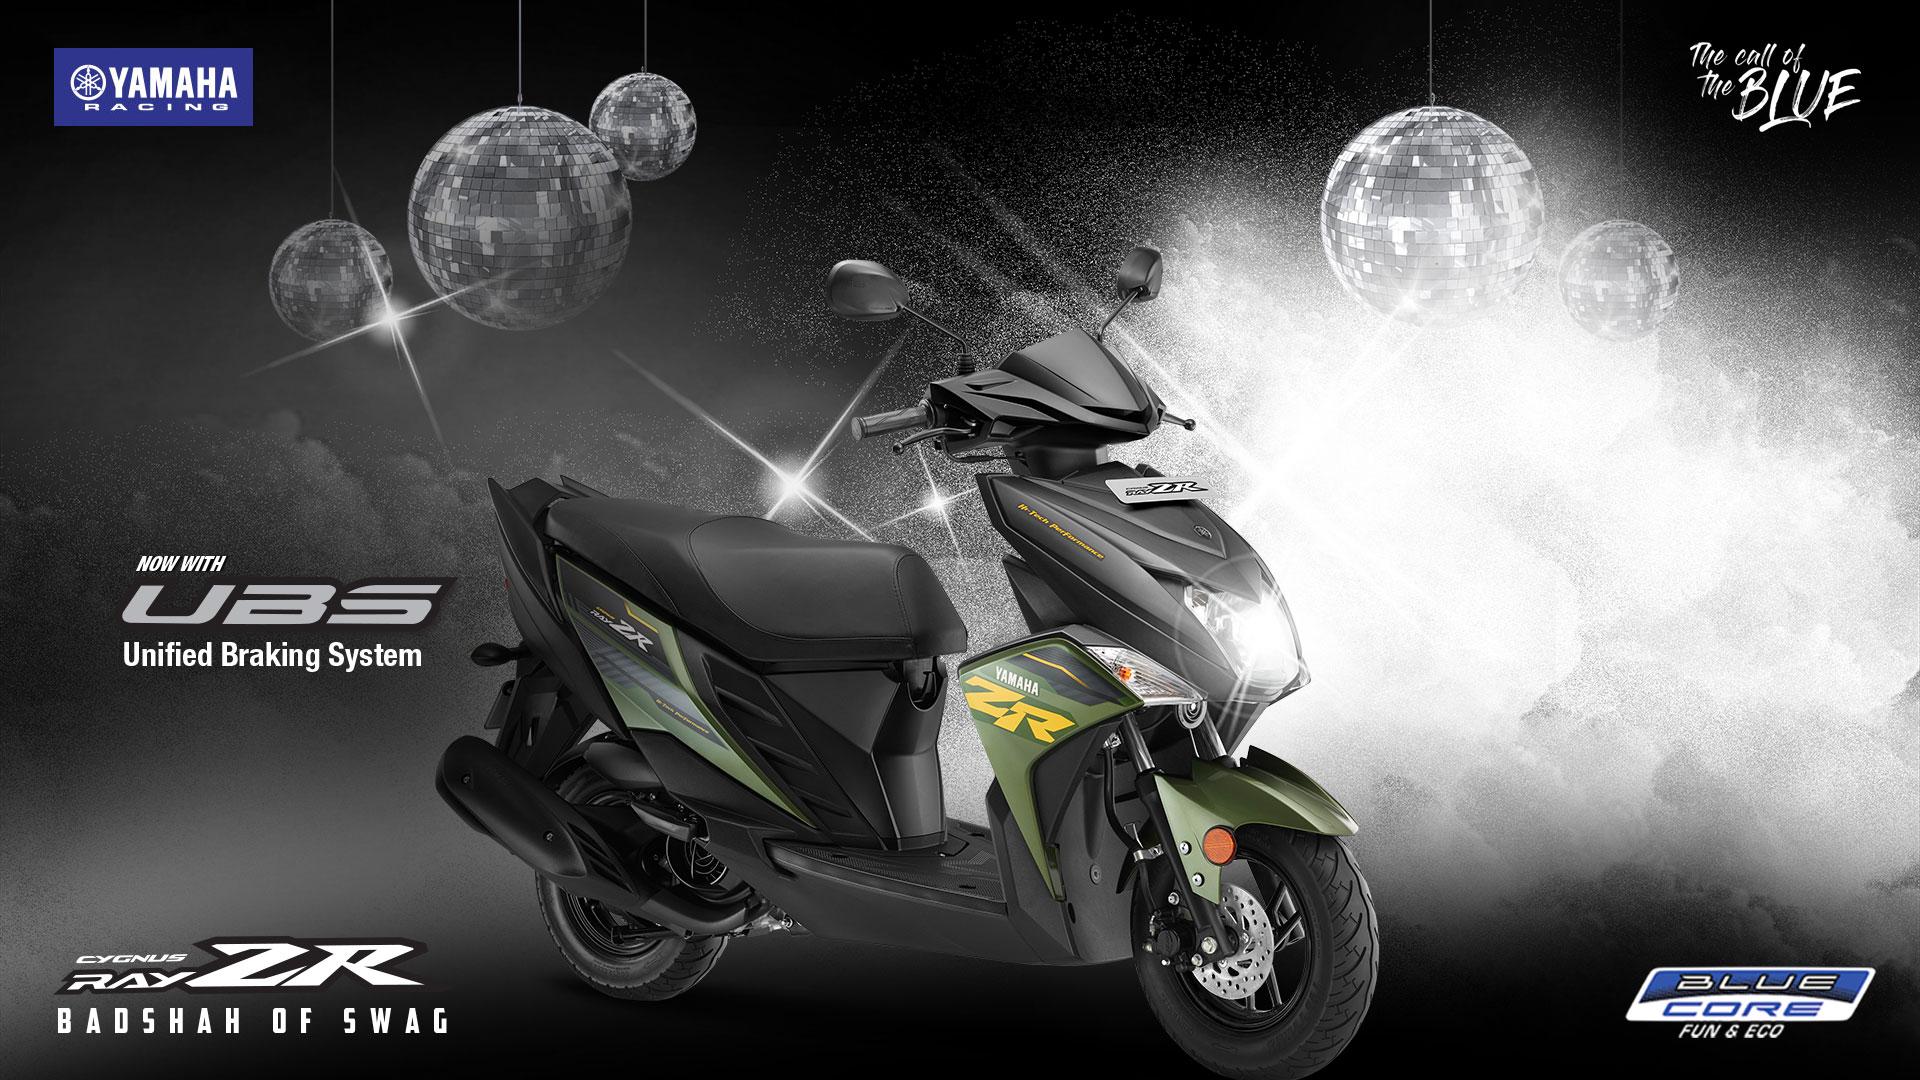 Yamaha RAY ZR Moto GP Edition Price, Model, Mileage, Specs